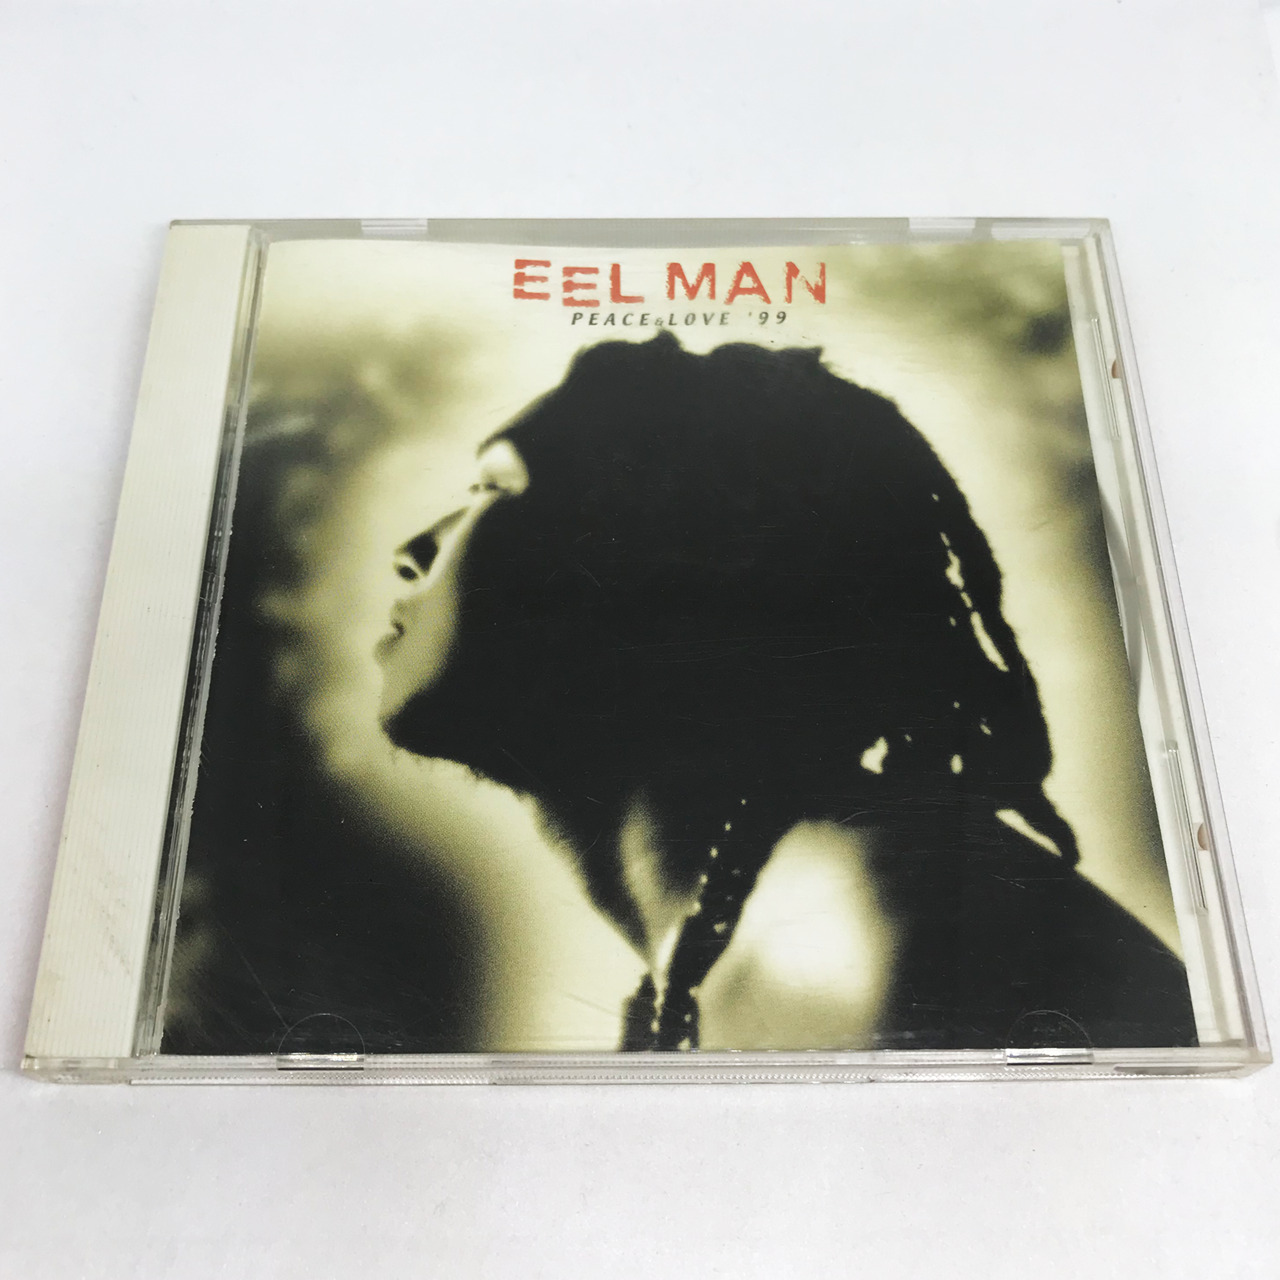 EELMAN / Peace & Love '99